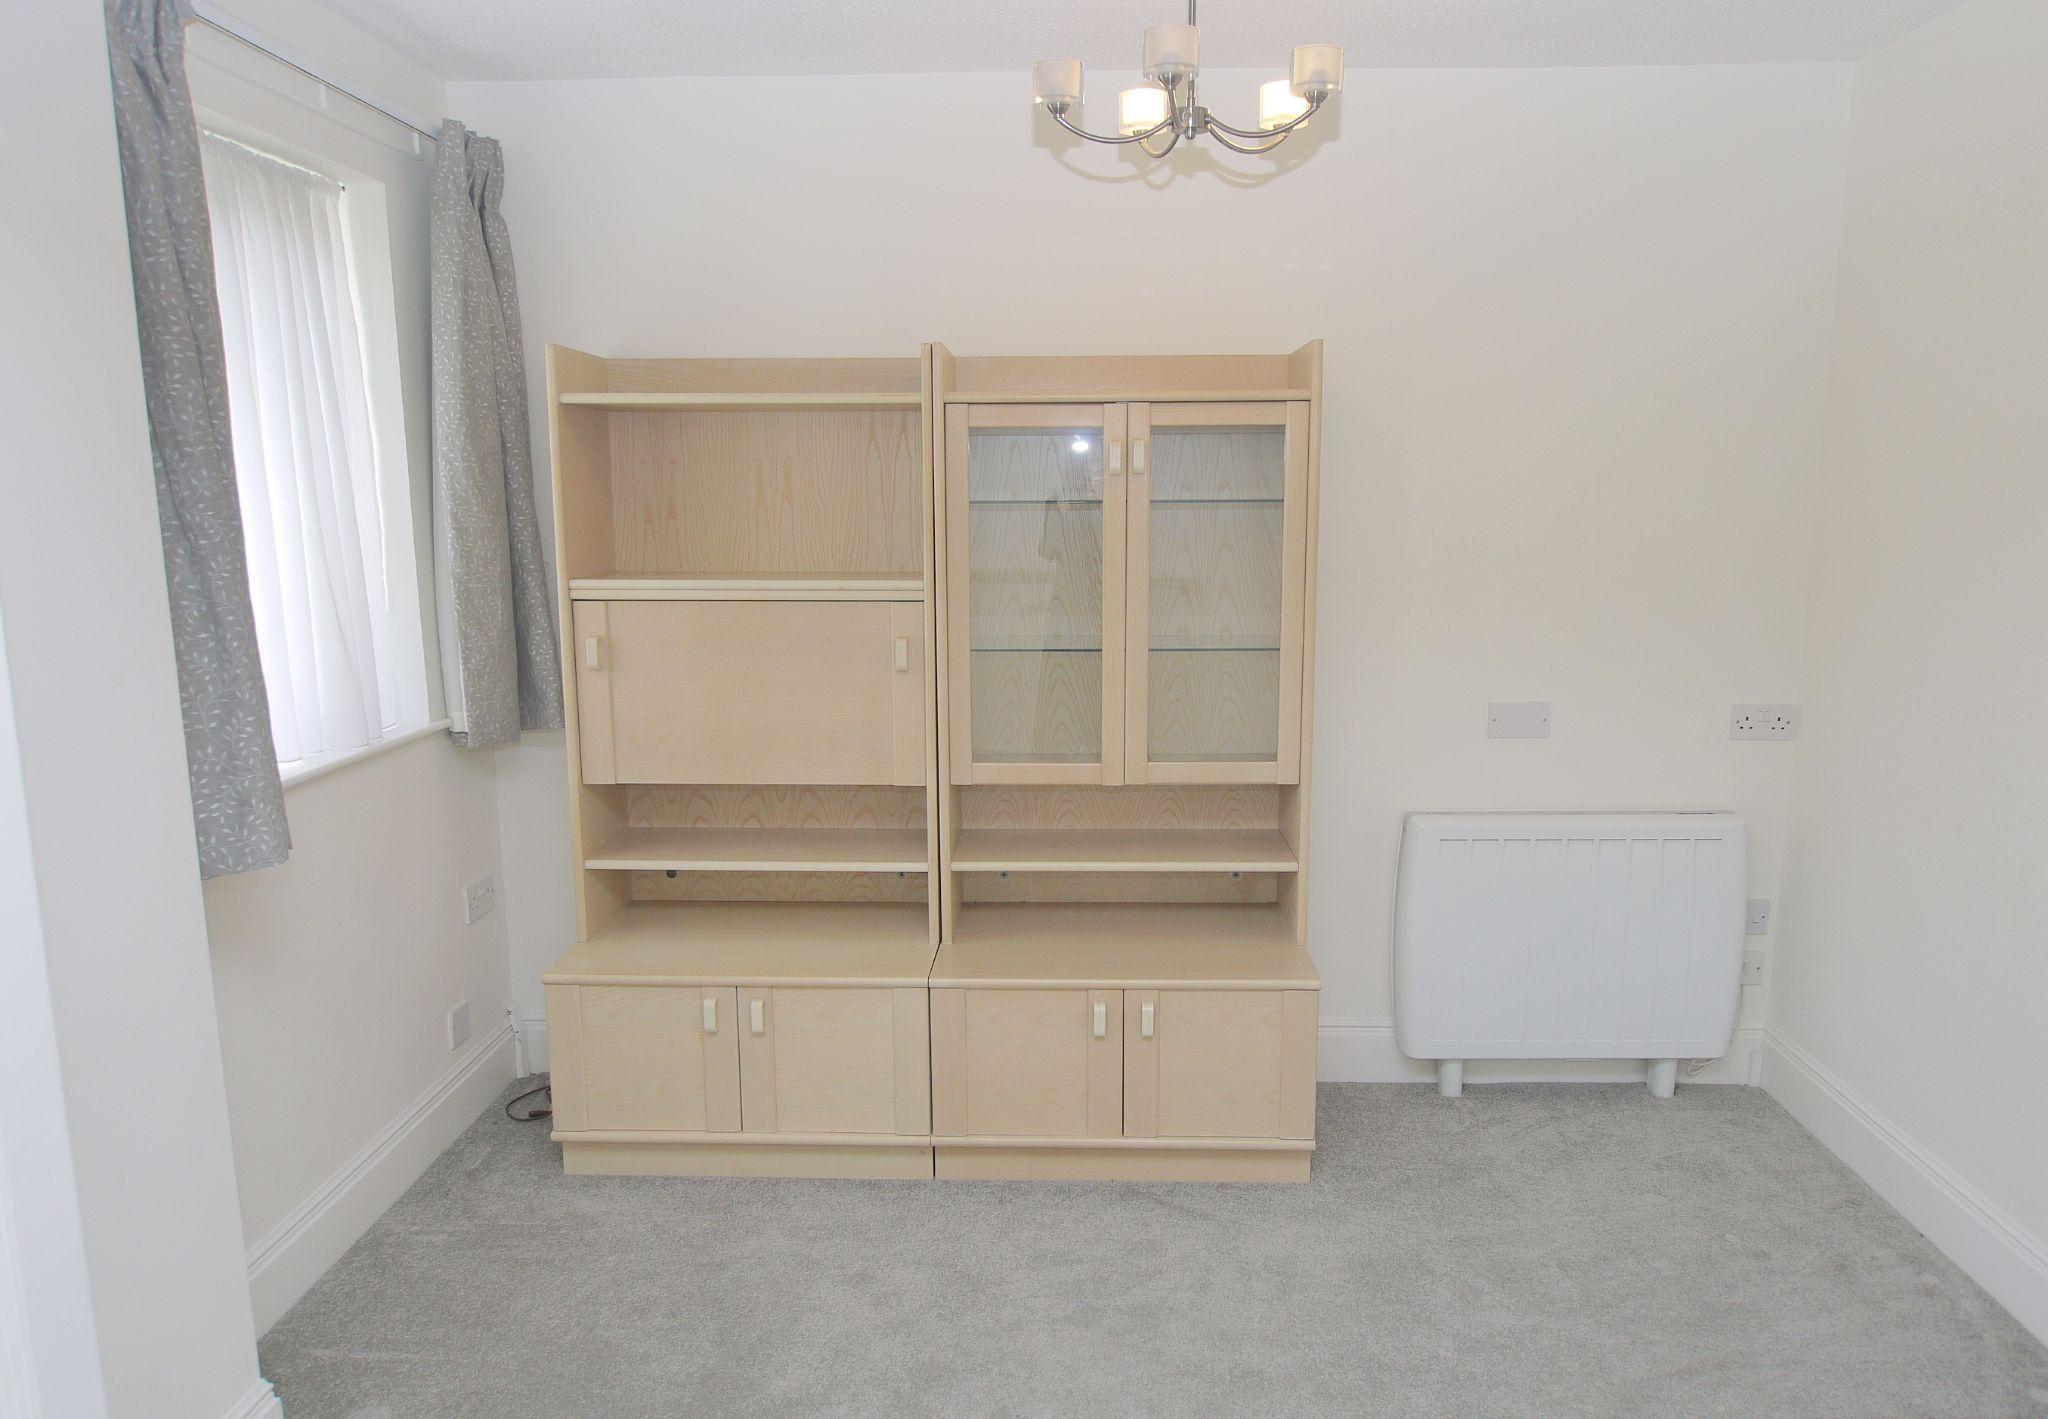 1 bedroom apartment For Sale in Sevenoaks - Photograph 6